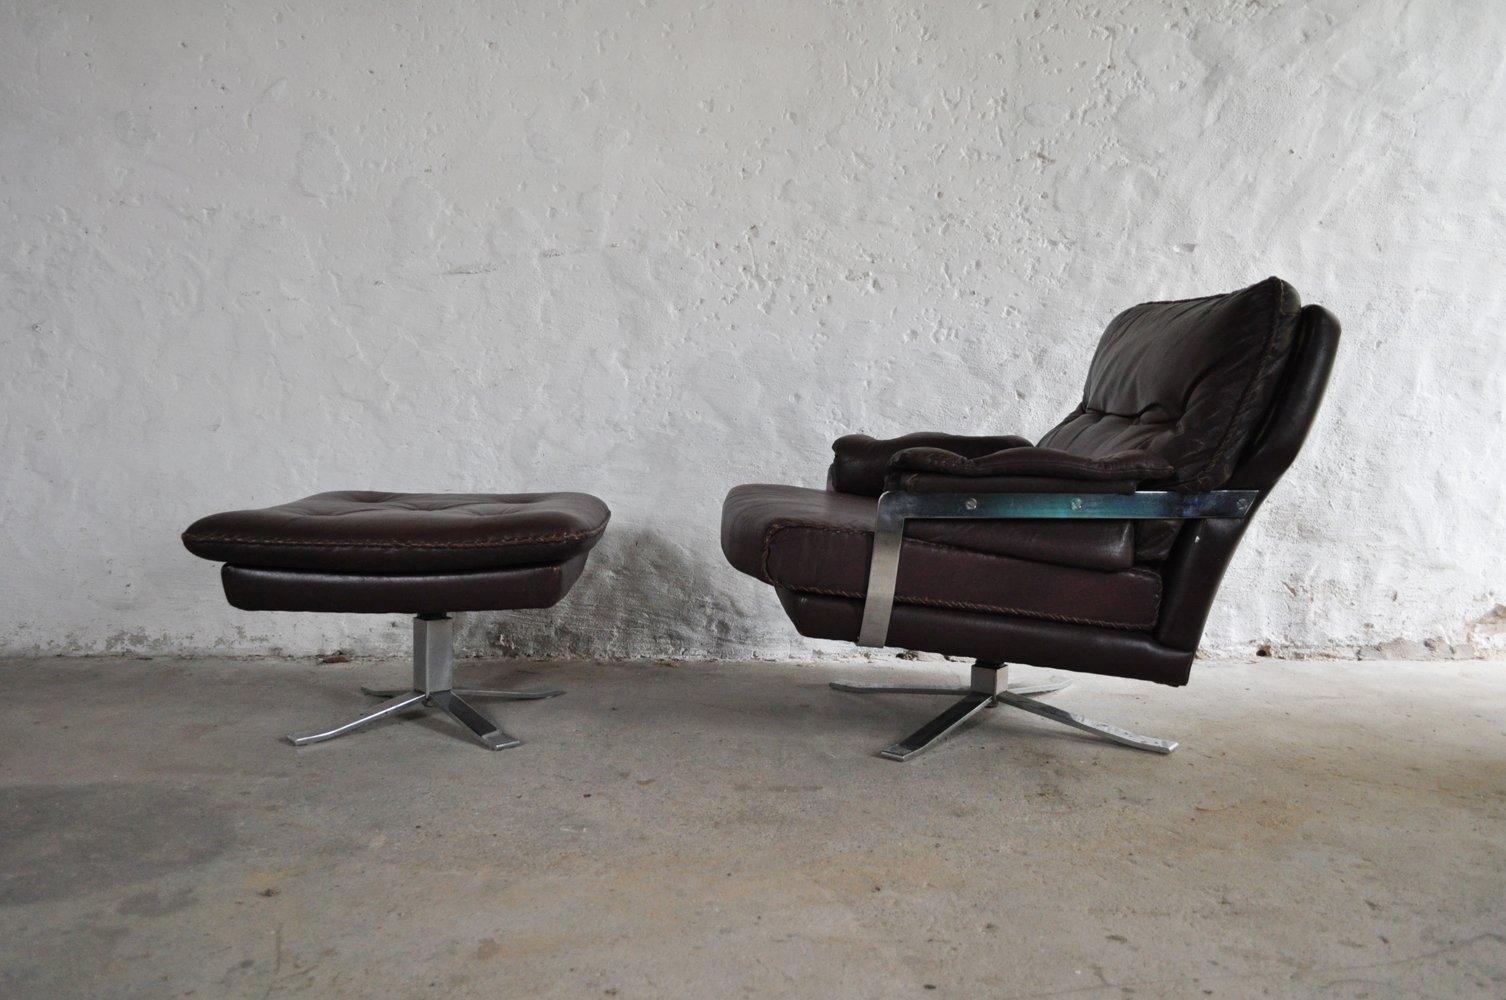 Rotbrauner Vintage Sessel aus Leder & Chrom mit Hocker von Arne Norell...